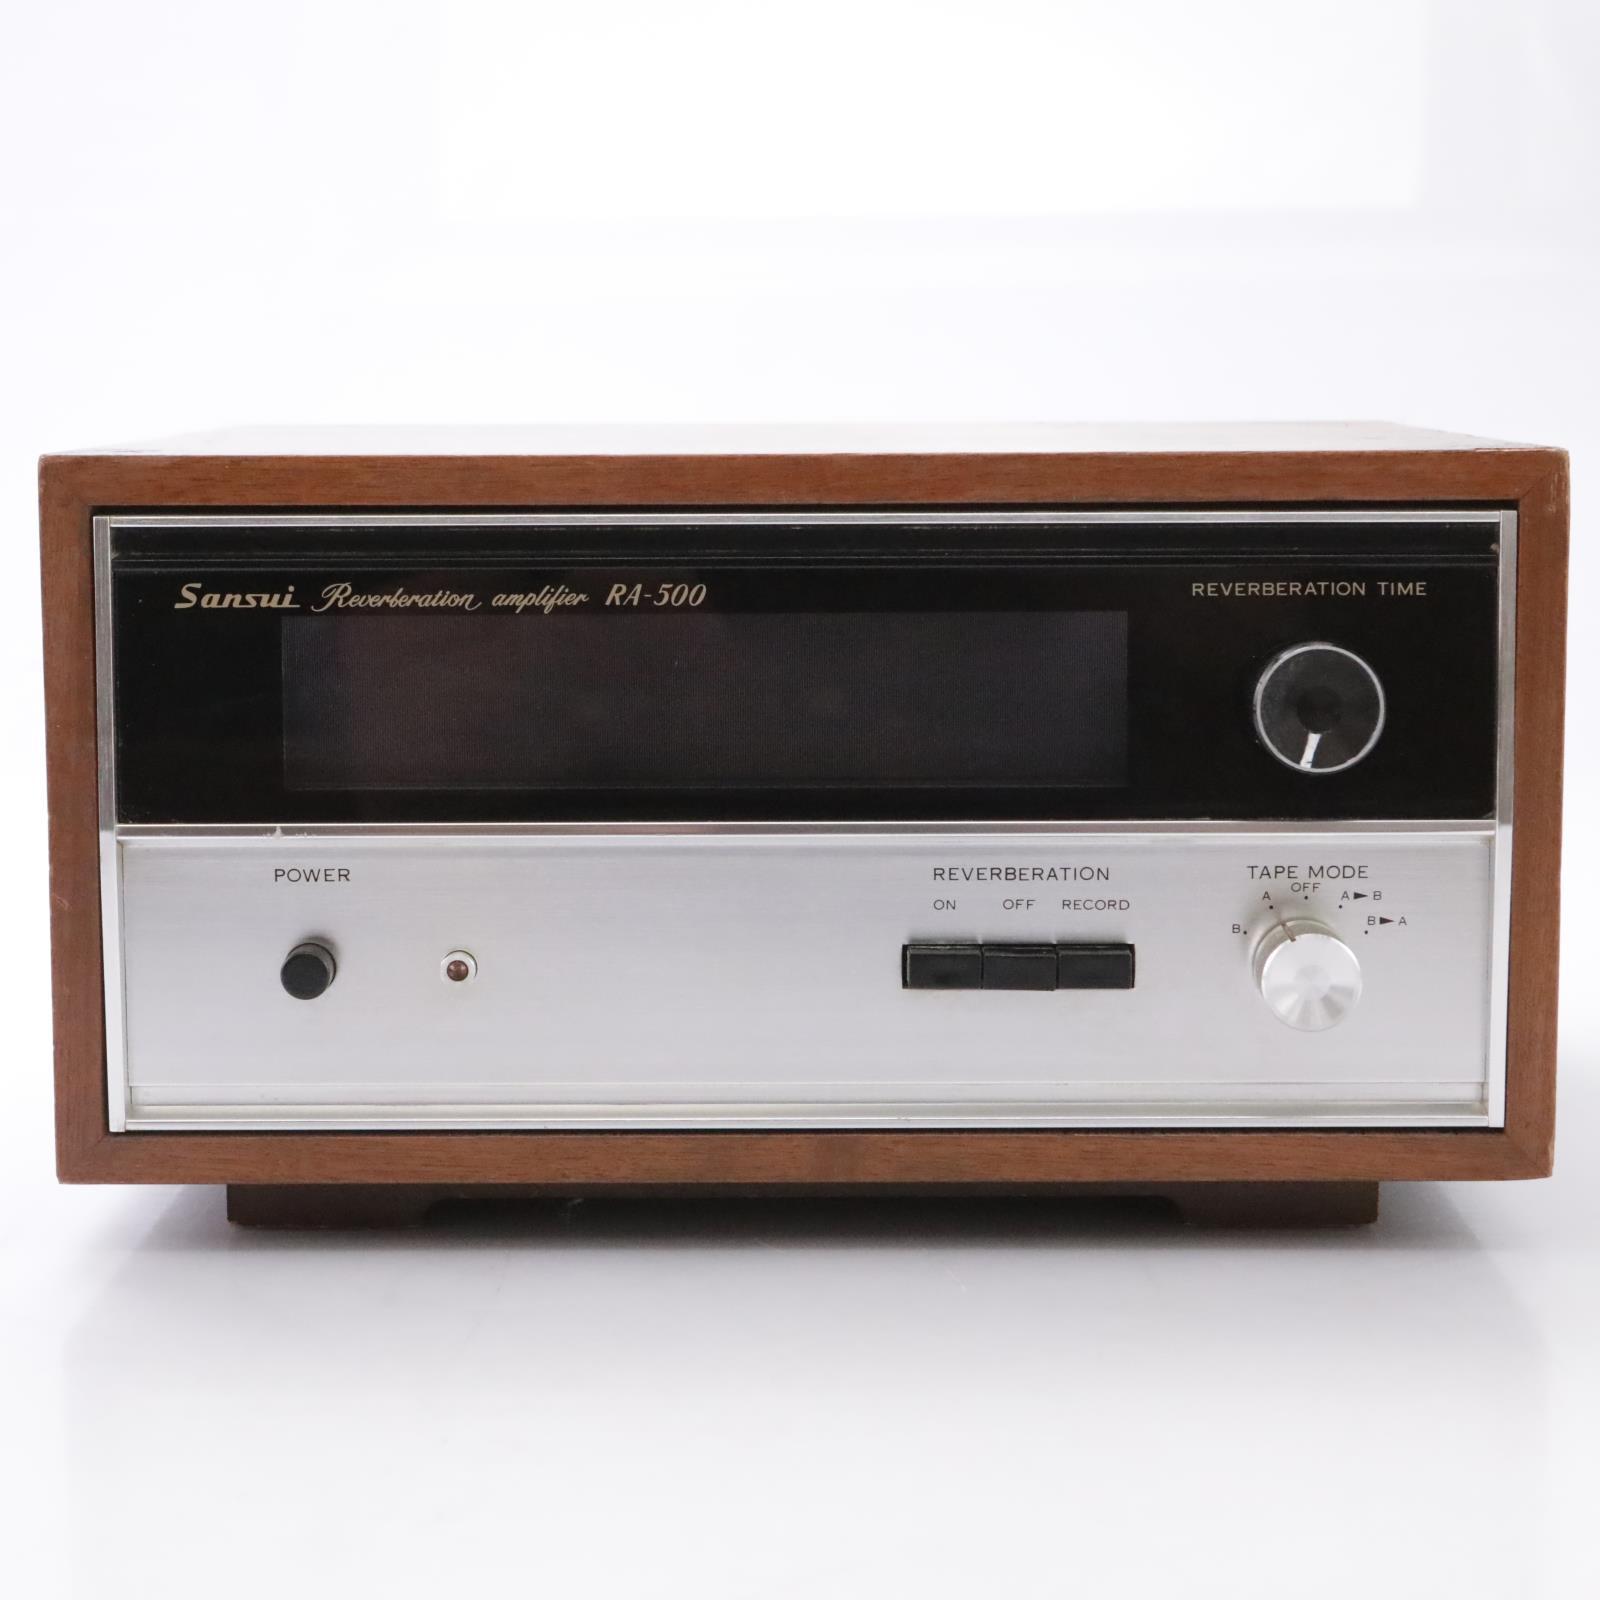 Sansui RA-500 Spring Reverberation Amplifier #43928